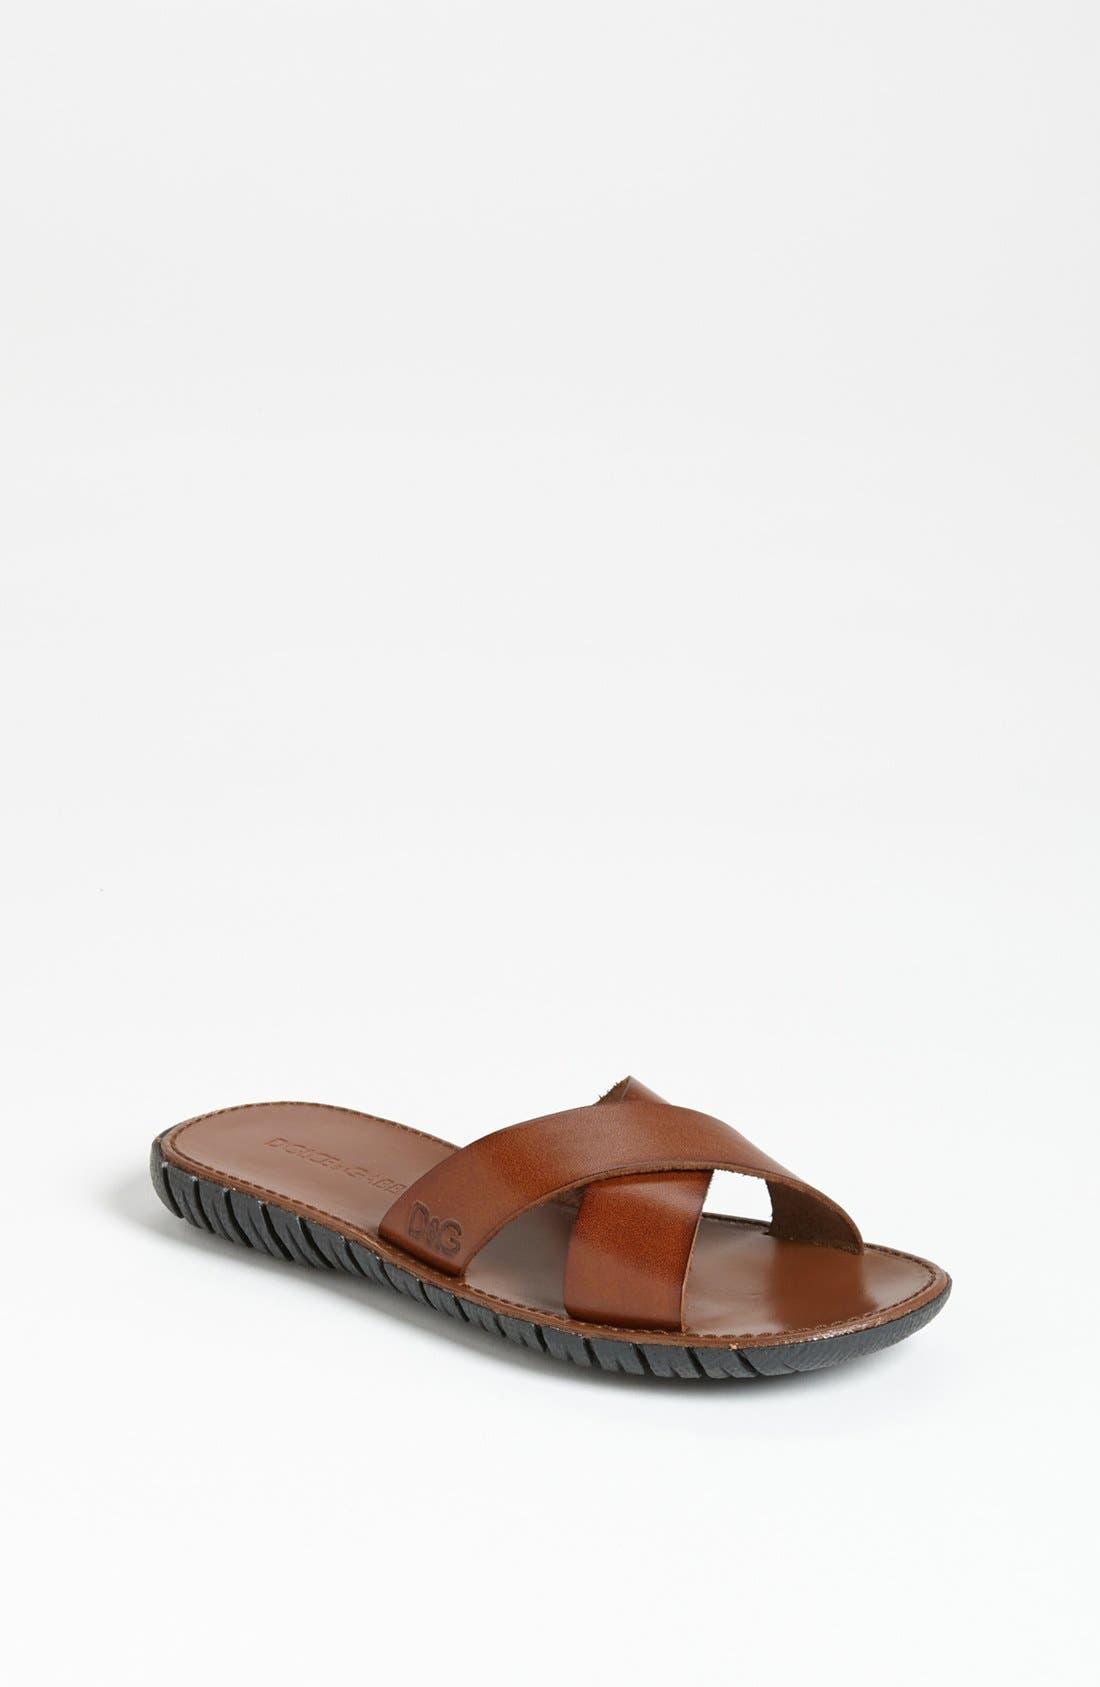 Main Image - Dolce&Gabbana Cross Strap Sandal (Little Kid & Big Kid)